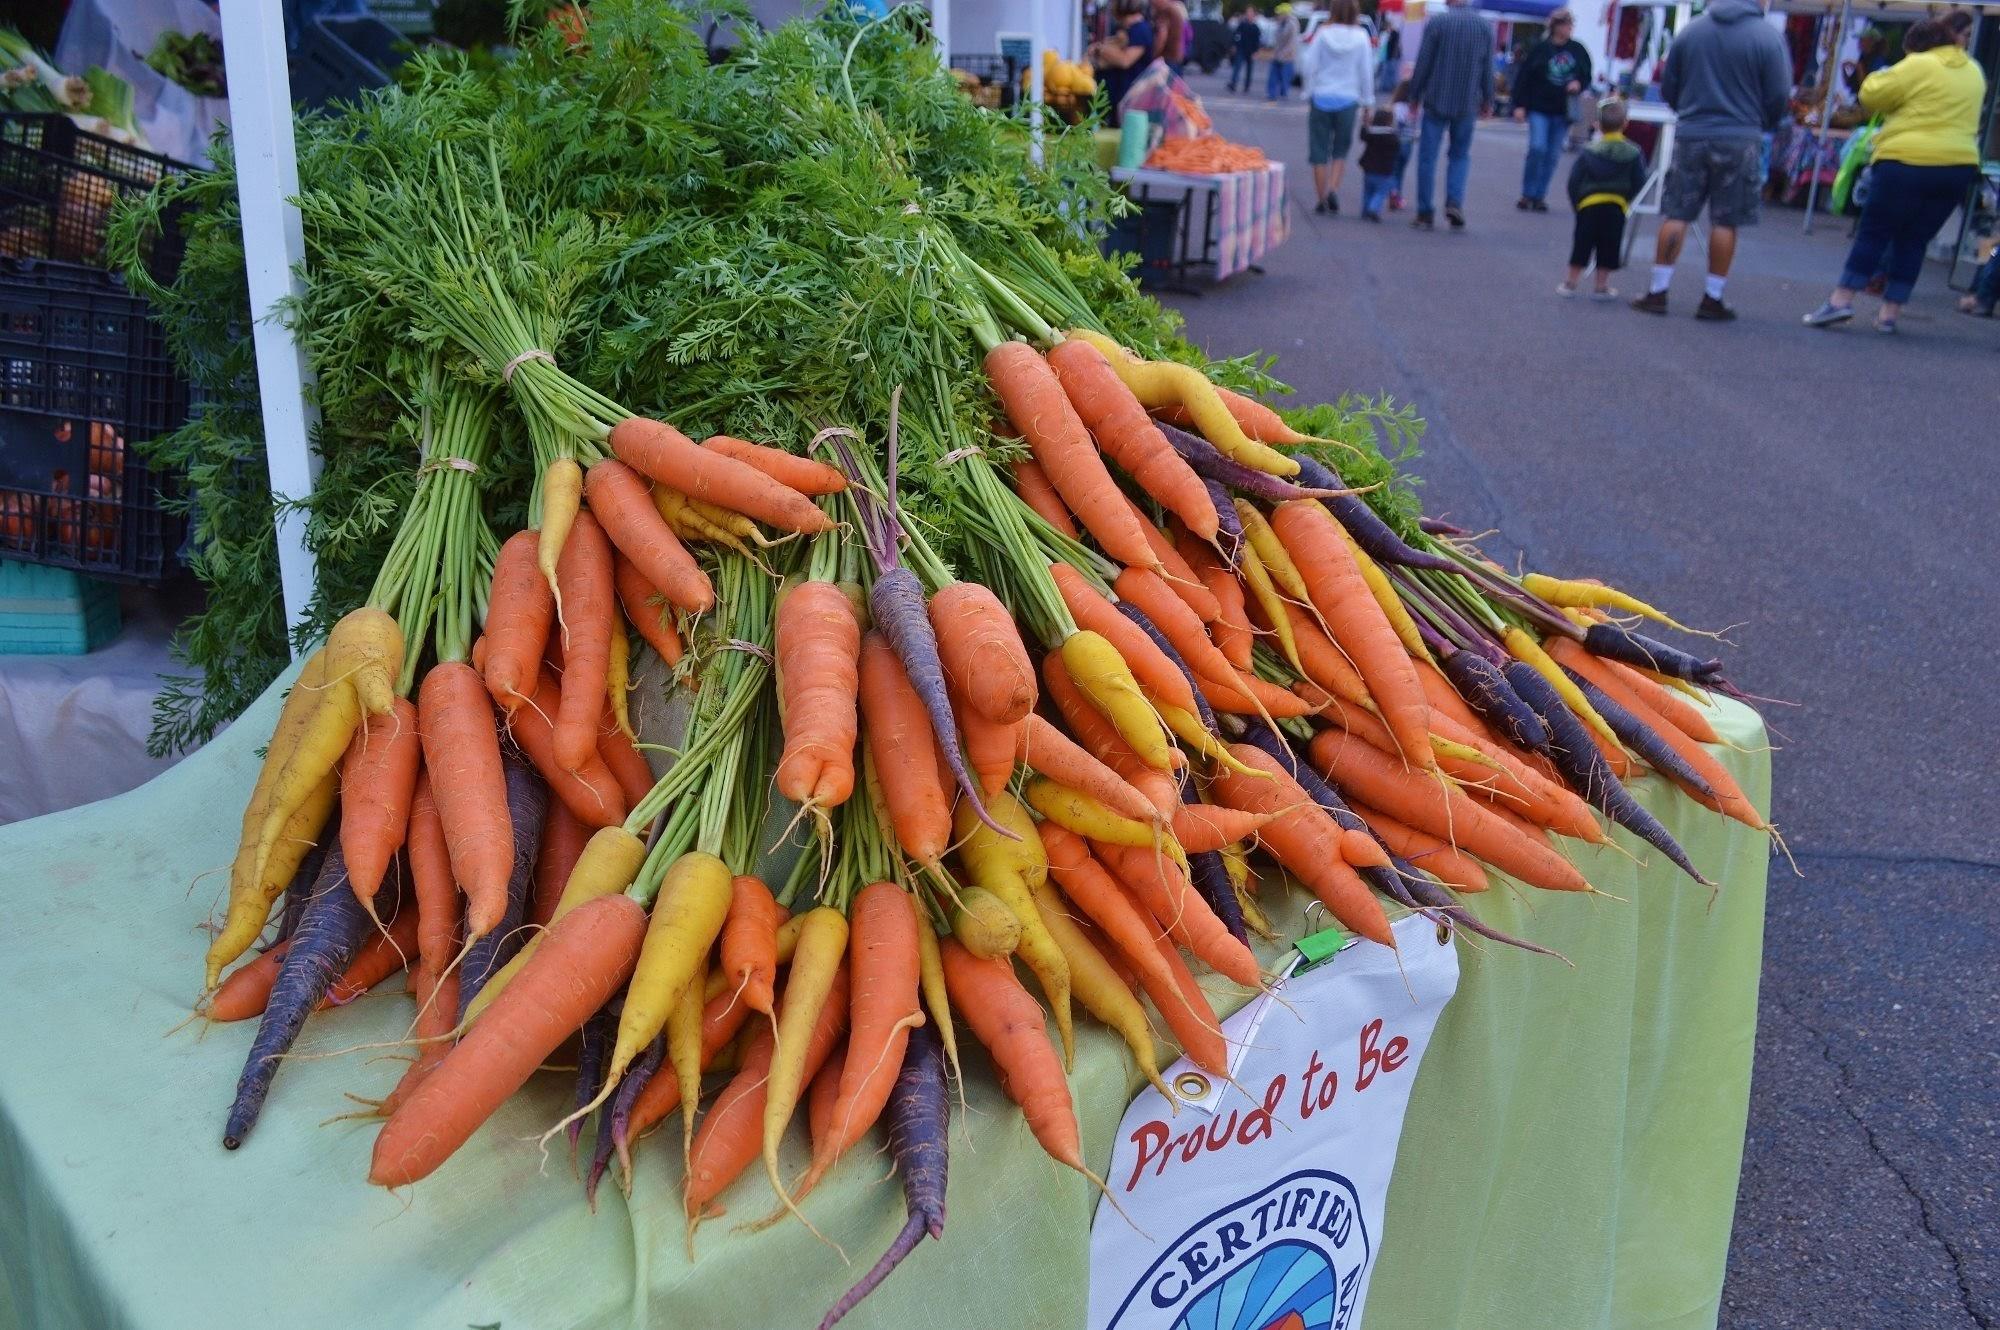 CNG_carrots.jpg